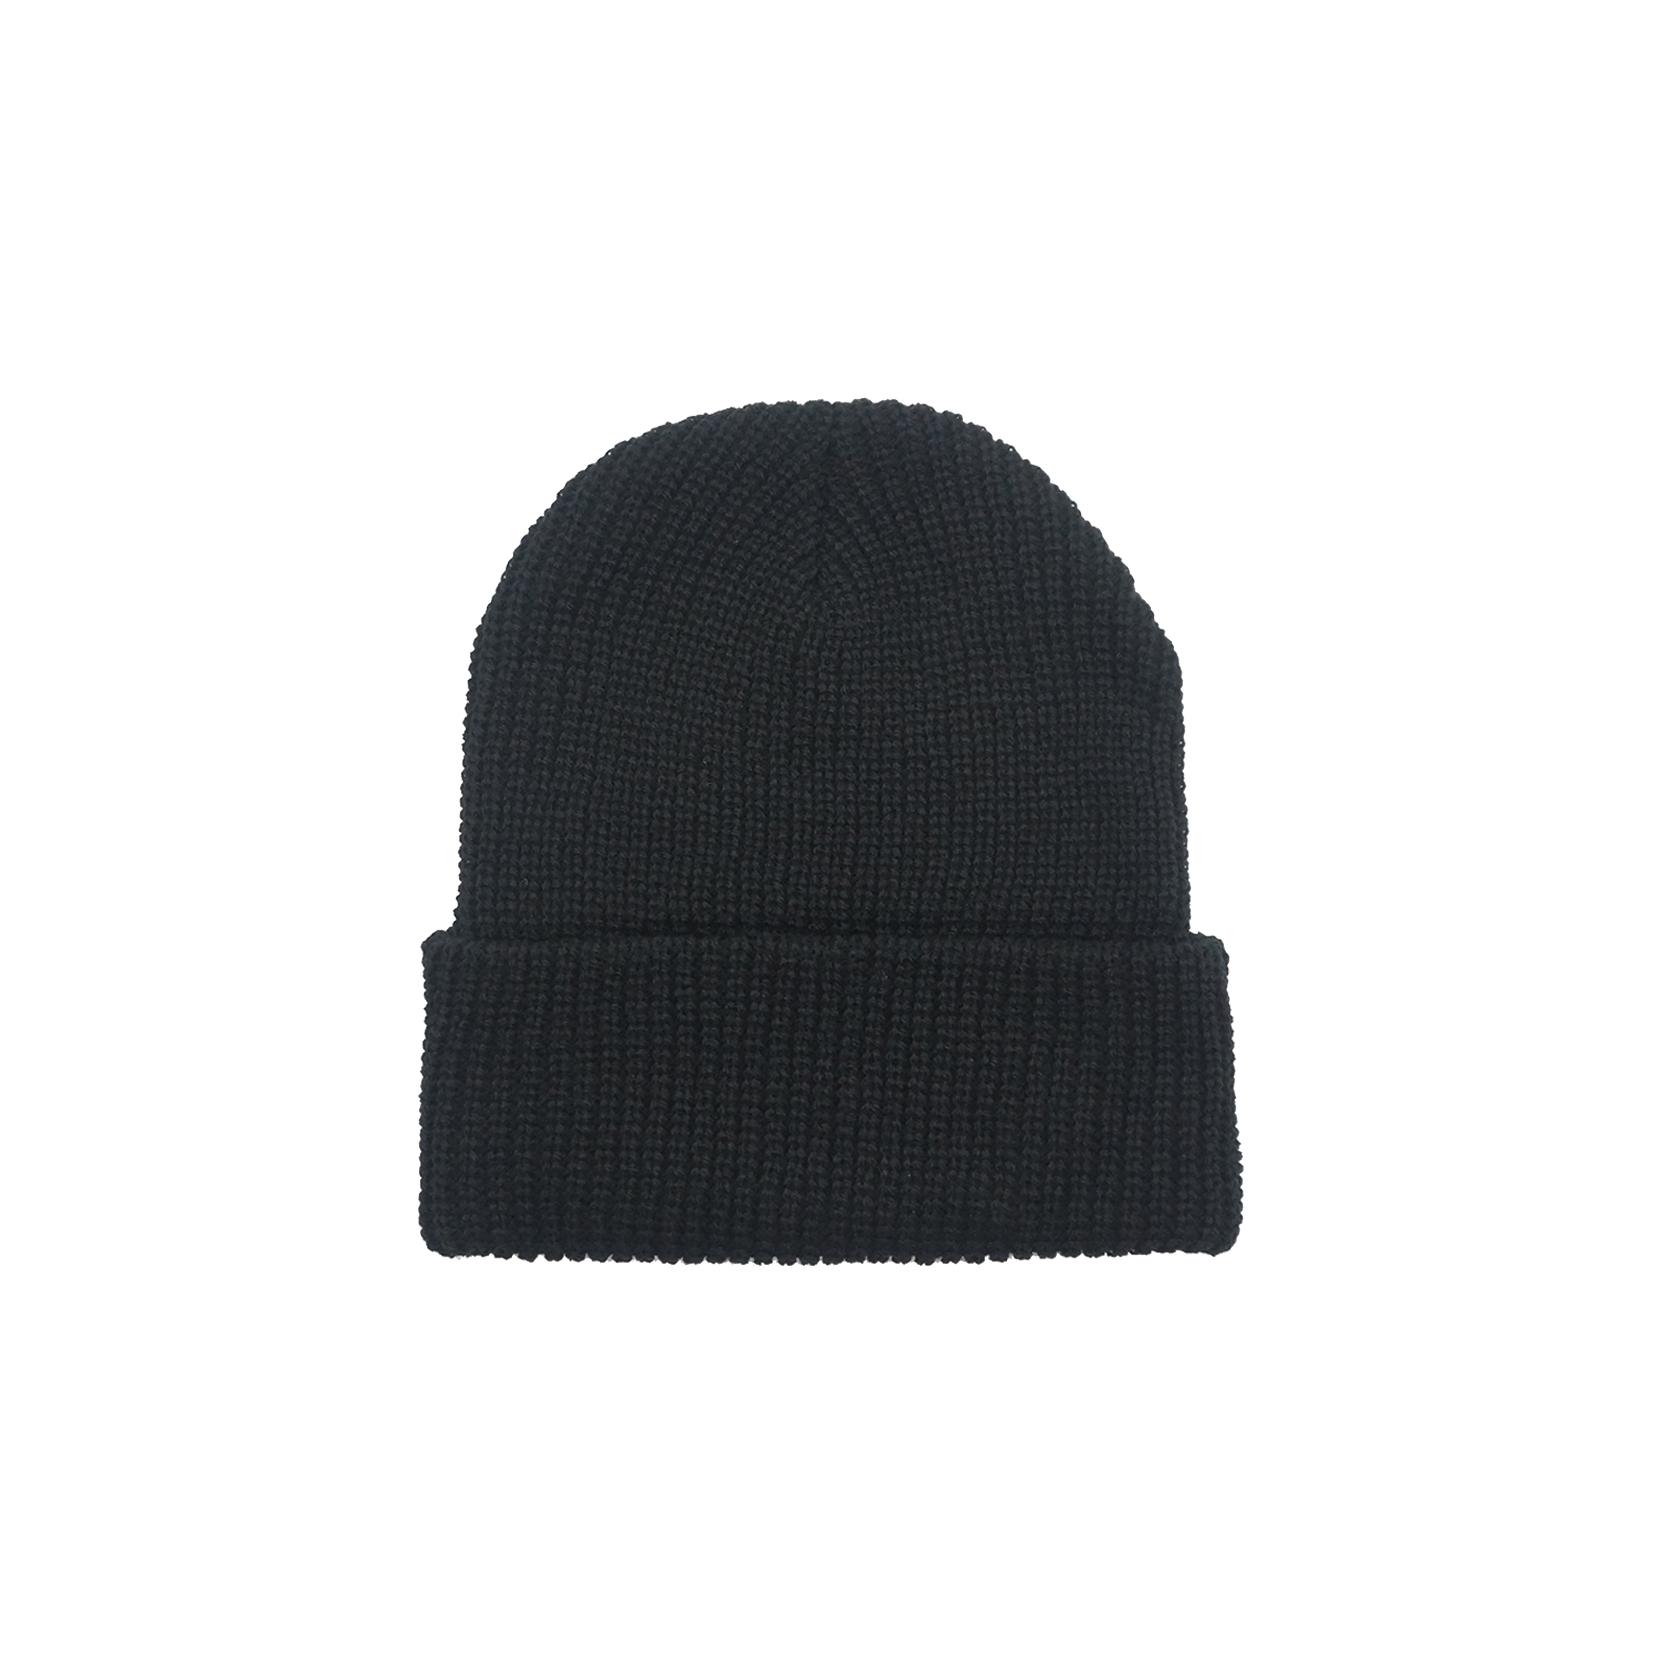 Rib Knit Beanie – Black